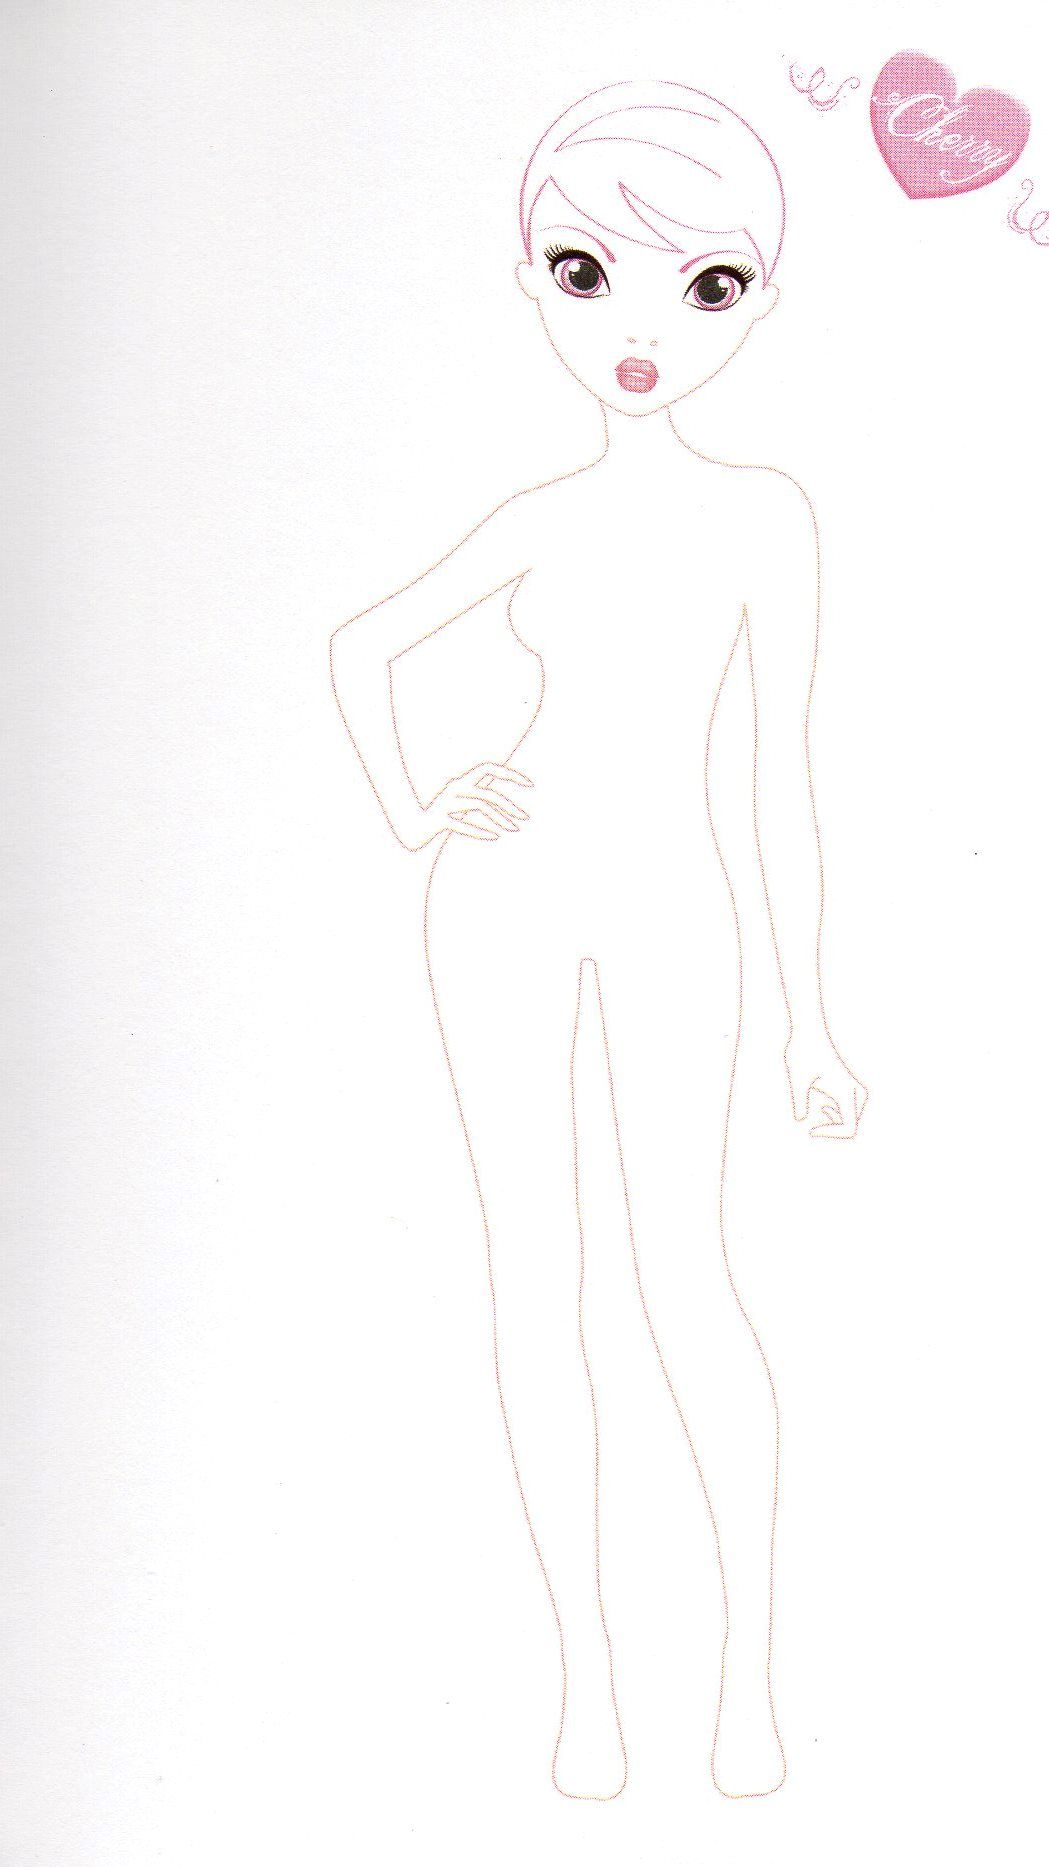 Topmodel Ausmalbilder Dance : Imagina Su Vestuario Top Model Biz Pinterest